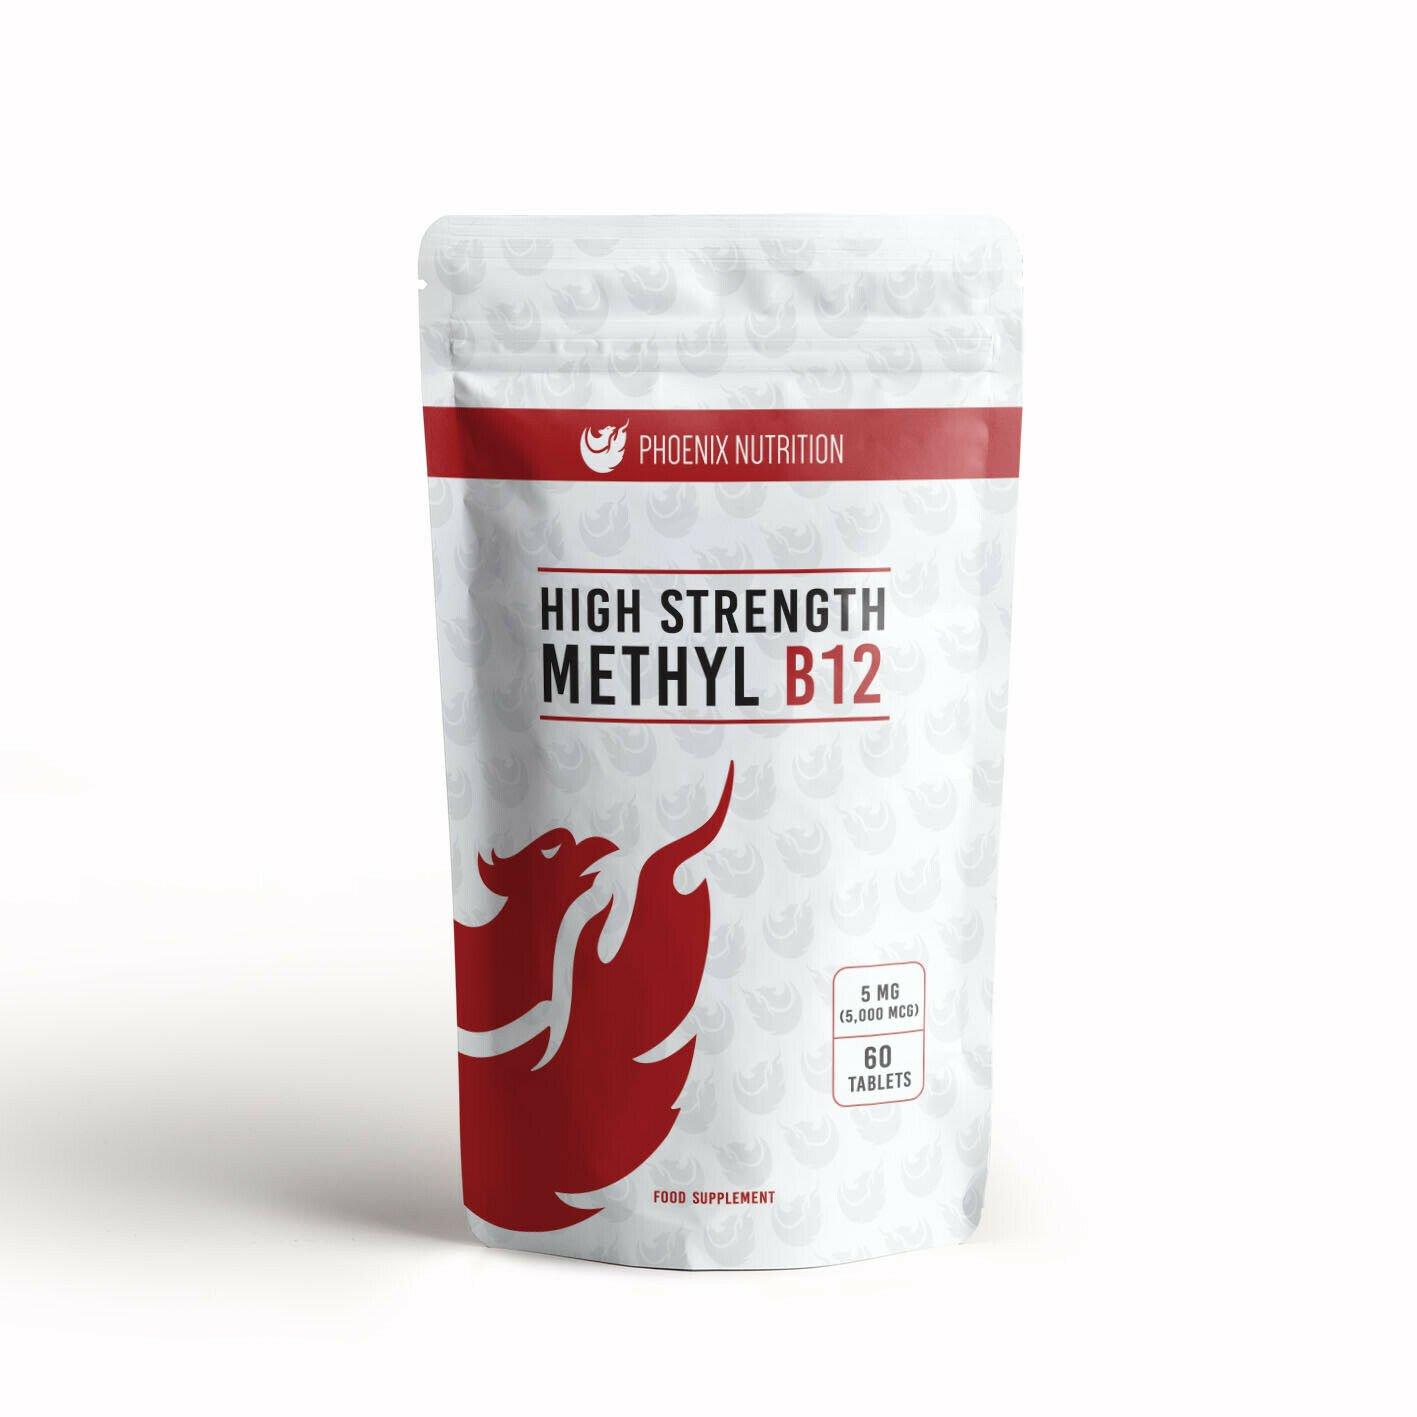 High Strength Methyl B12 5mg X 60 Tablets [5000mcg] Vitamin Methylcobalamin